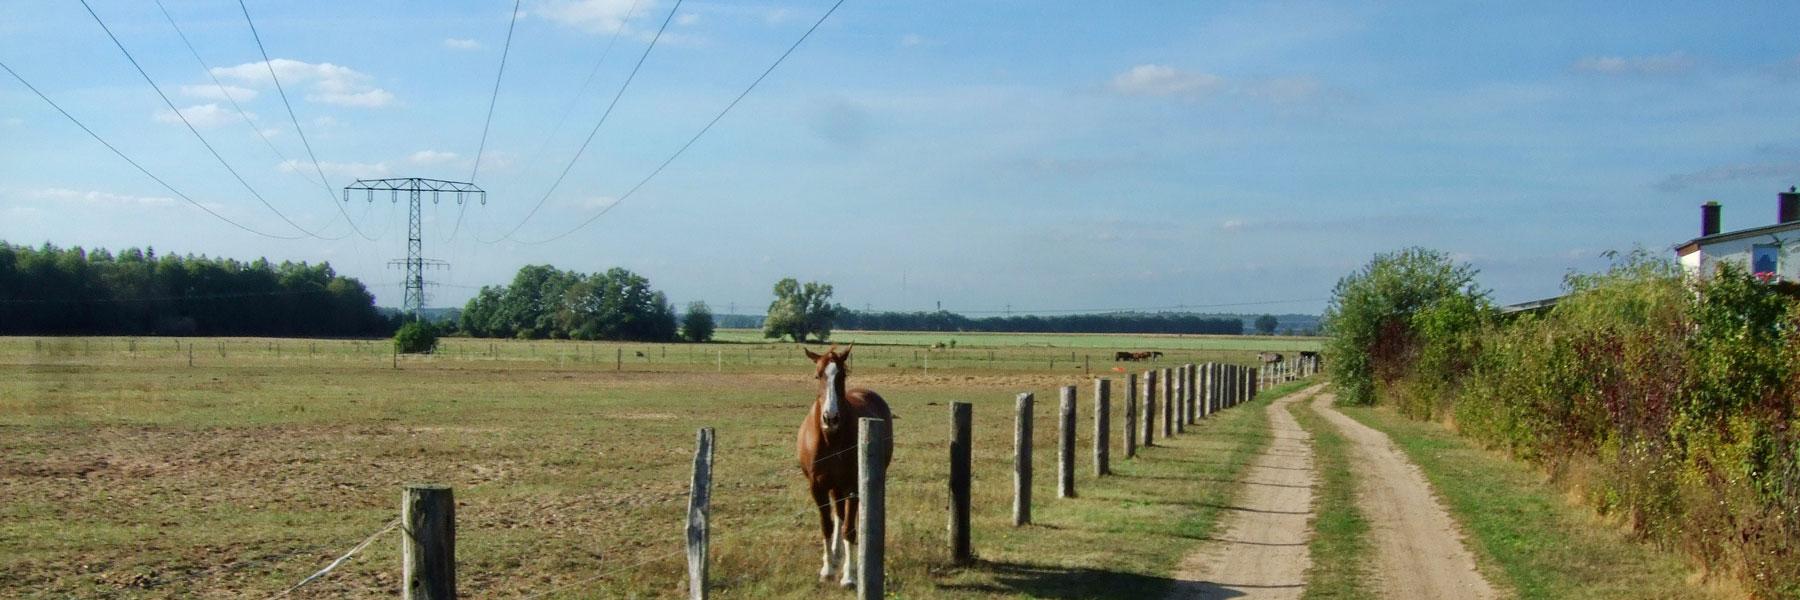 Pferdekoppel - Reiterhof Mietz